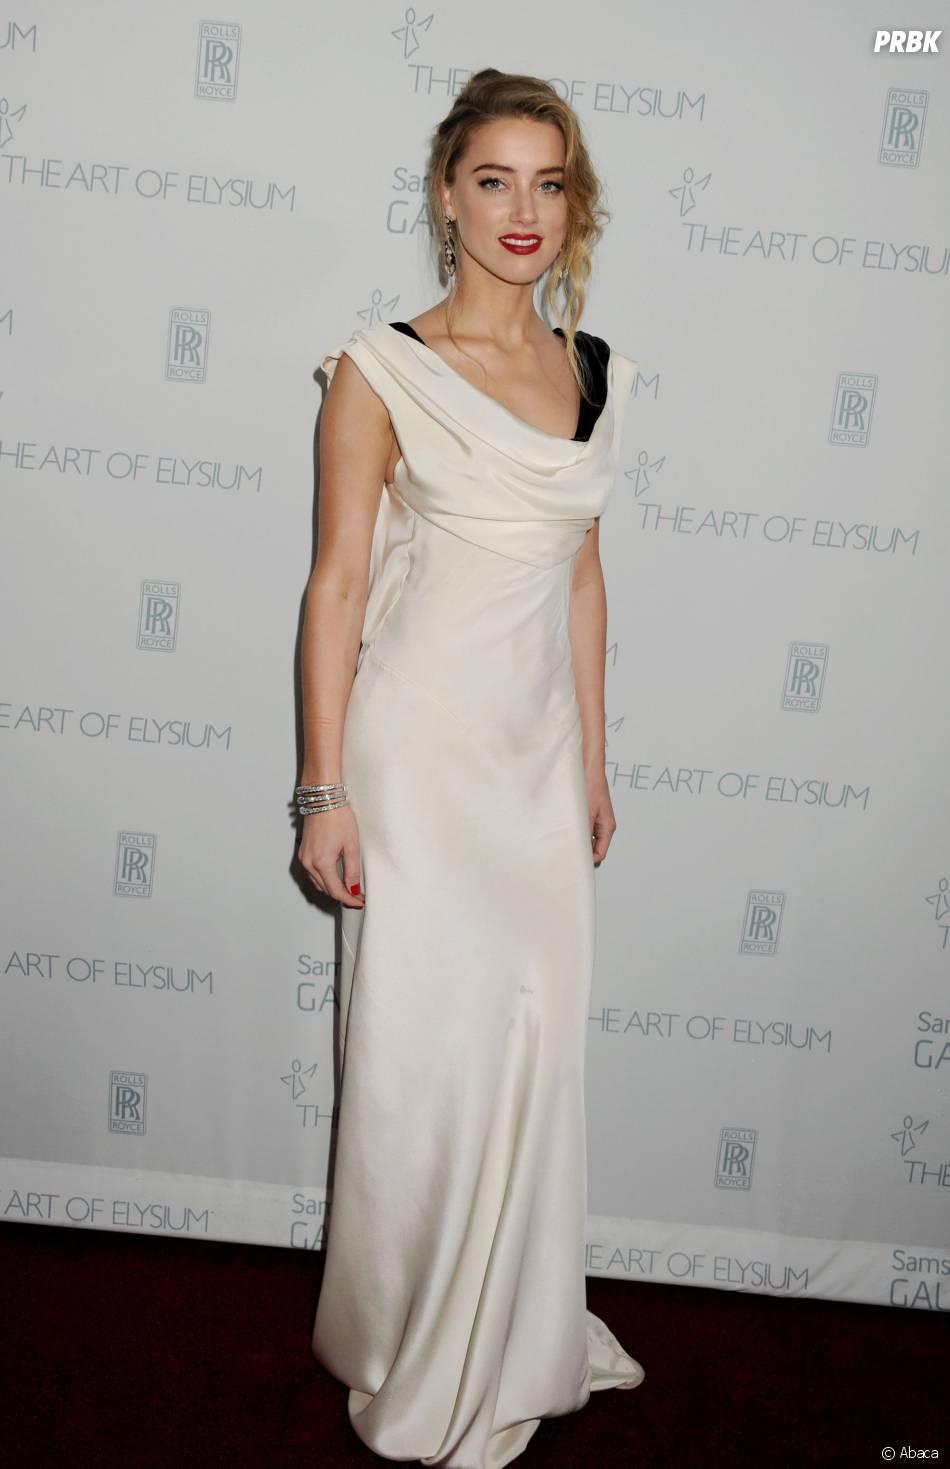 Amber Heard seyx lors d'une soirée